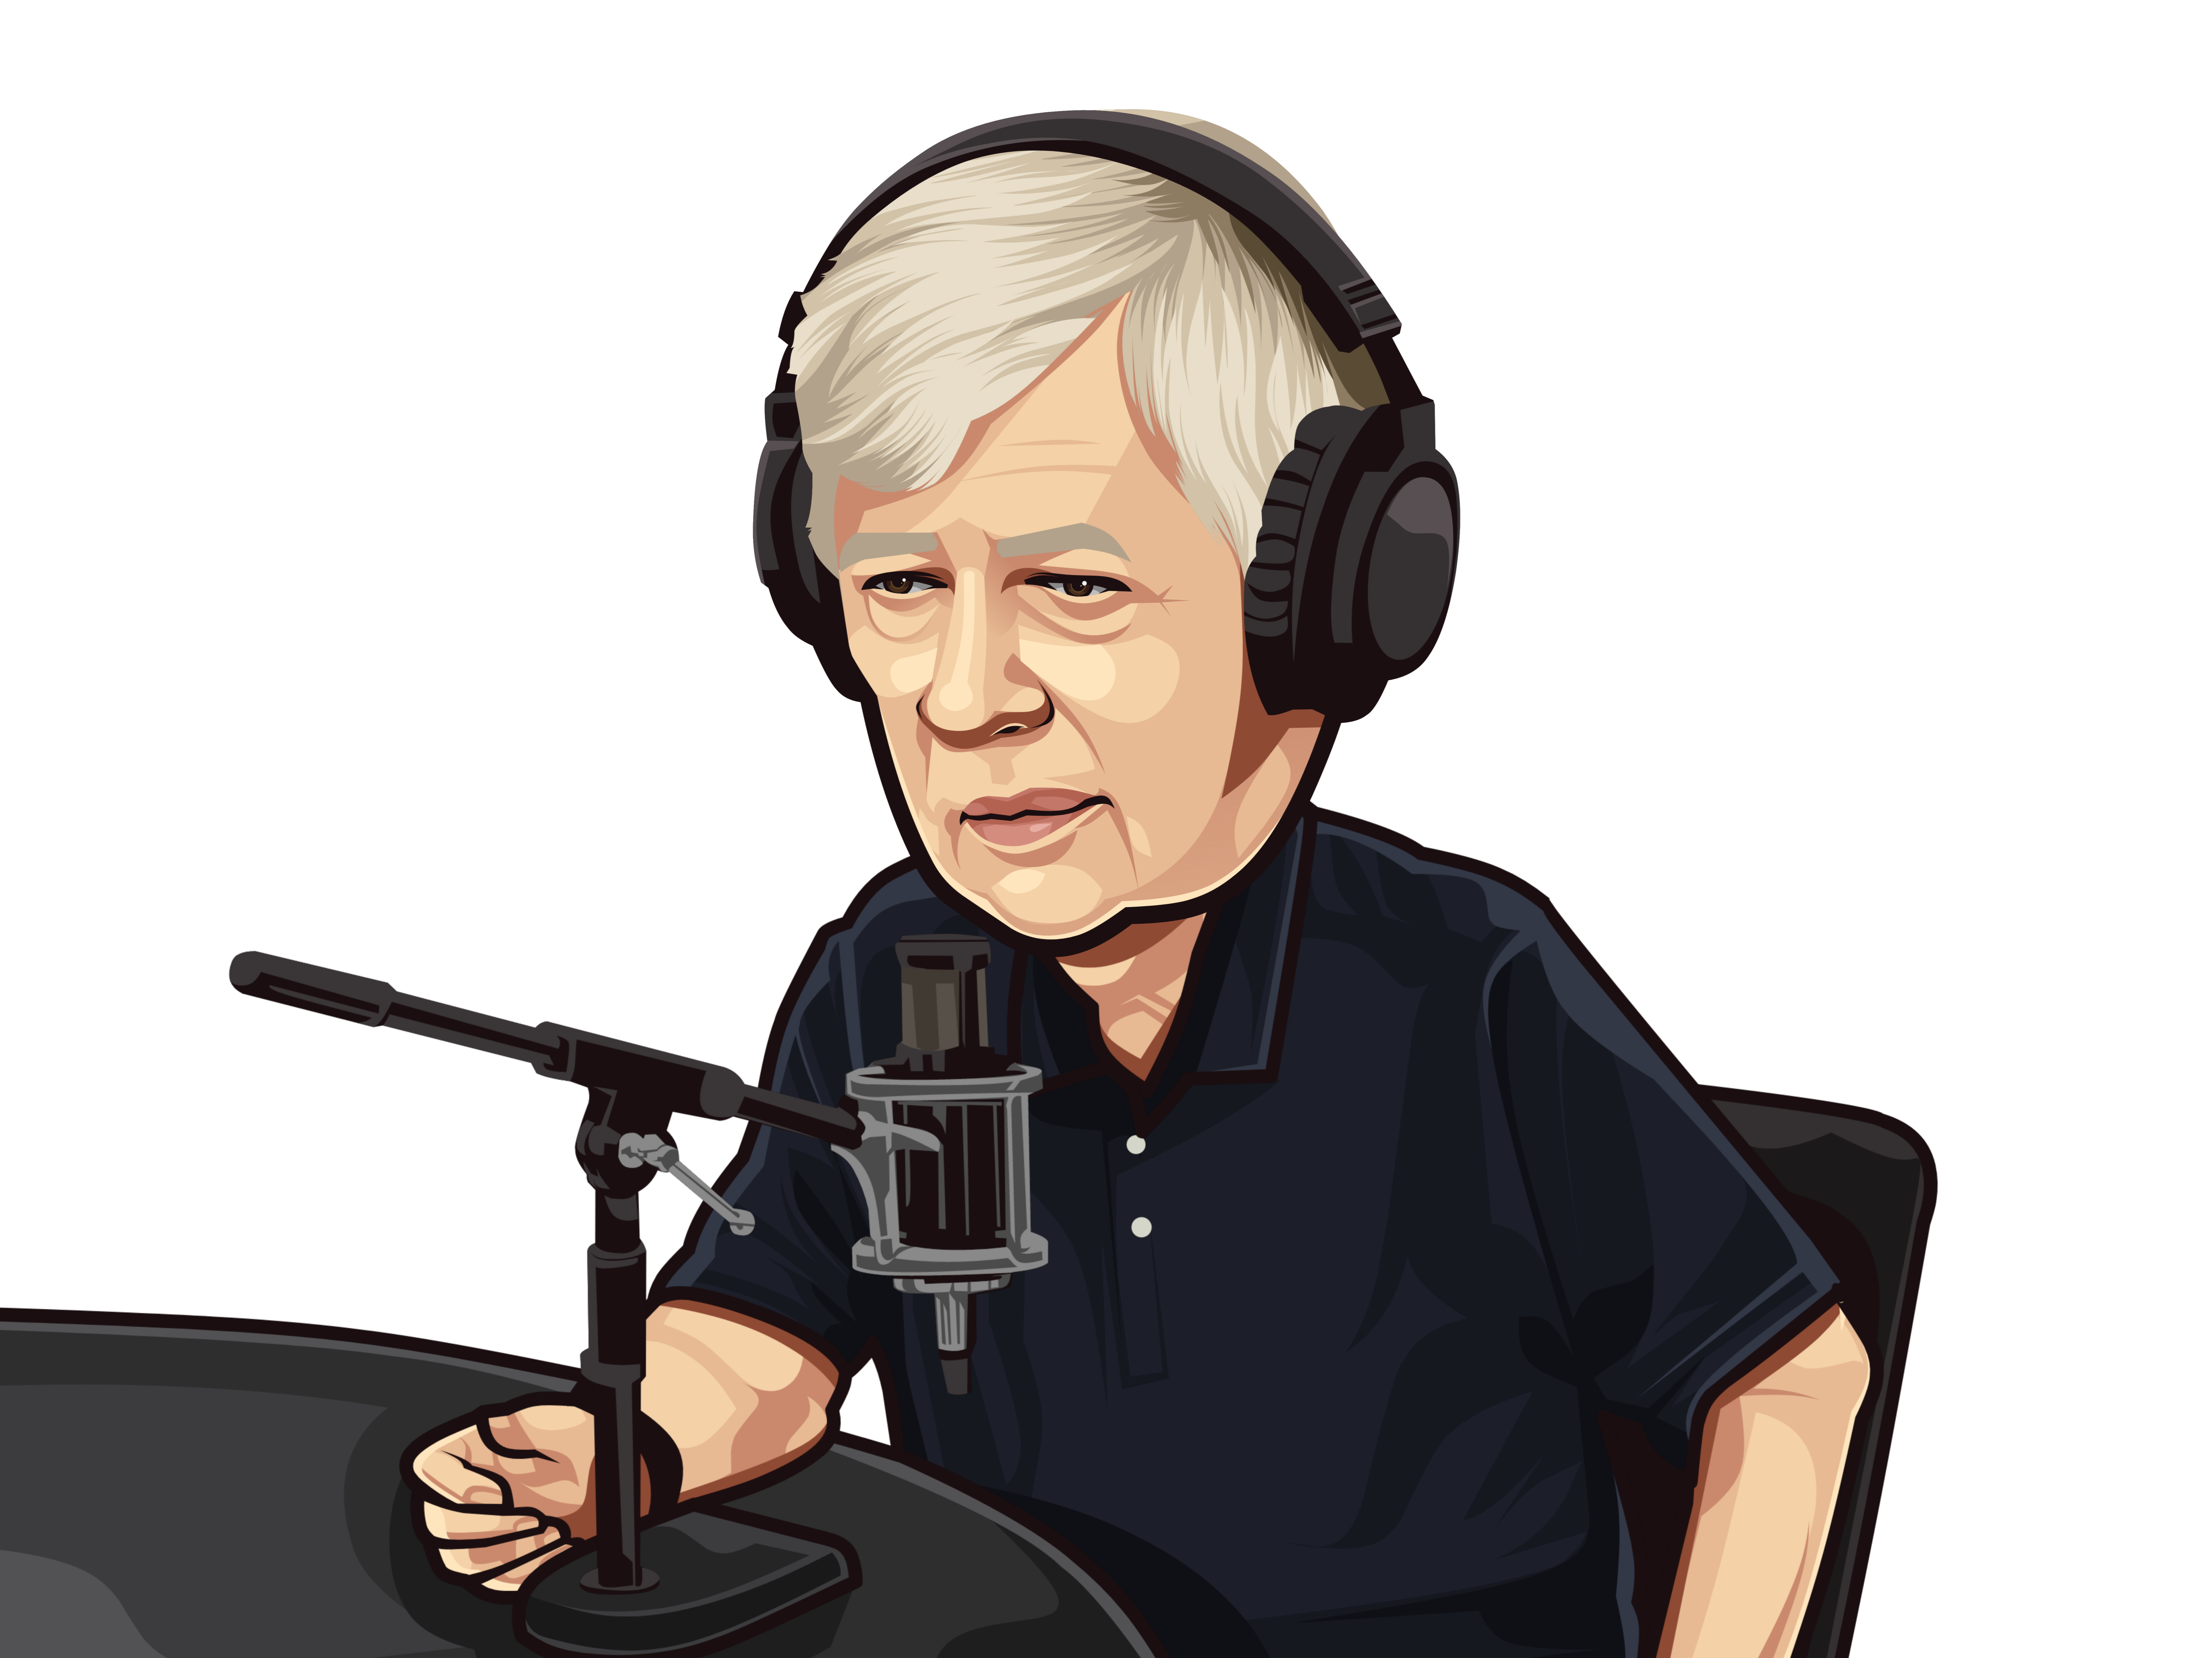 David podcast caricature 2020 +